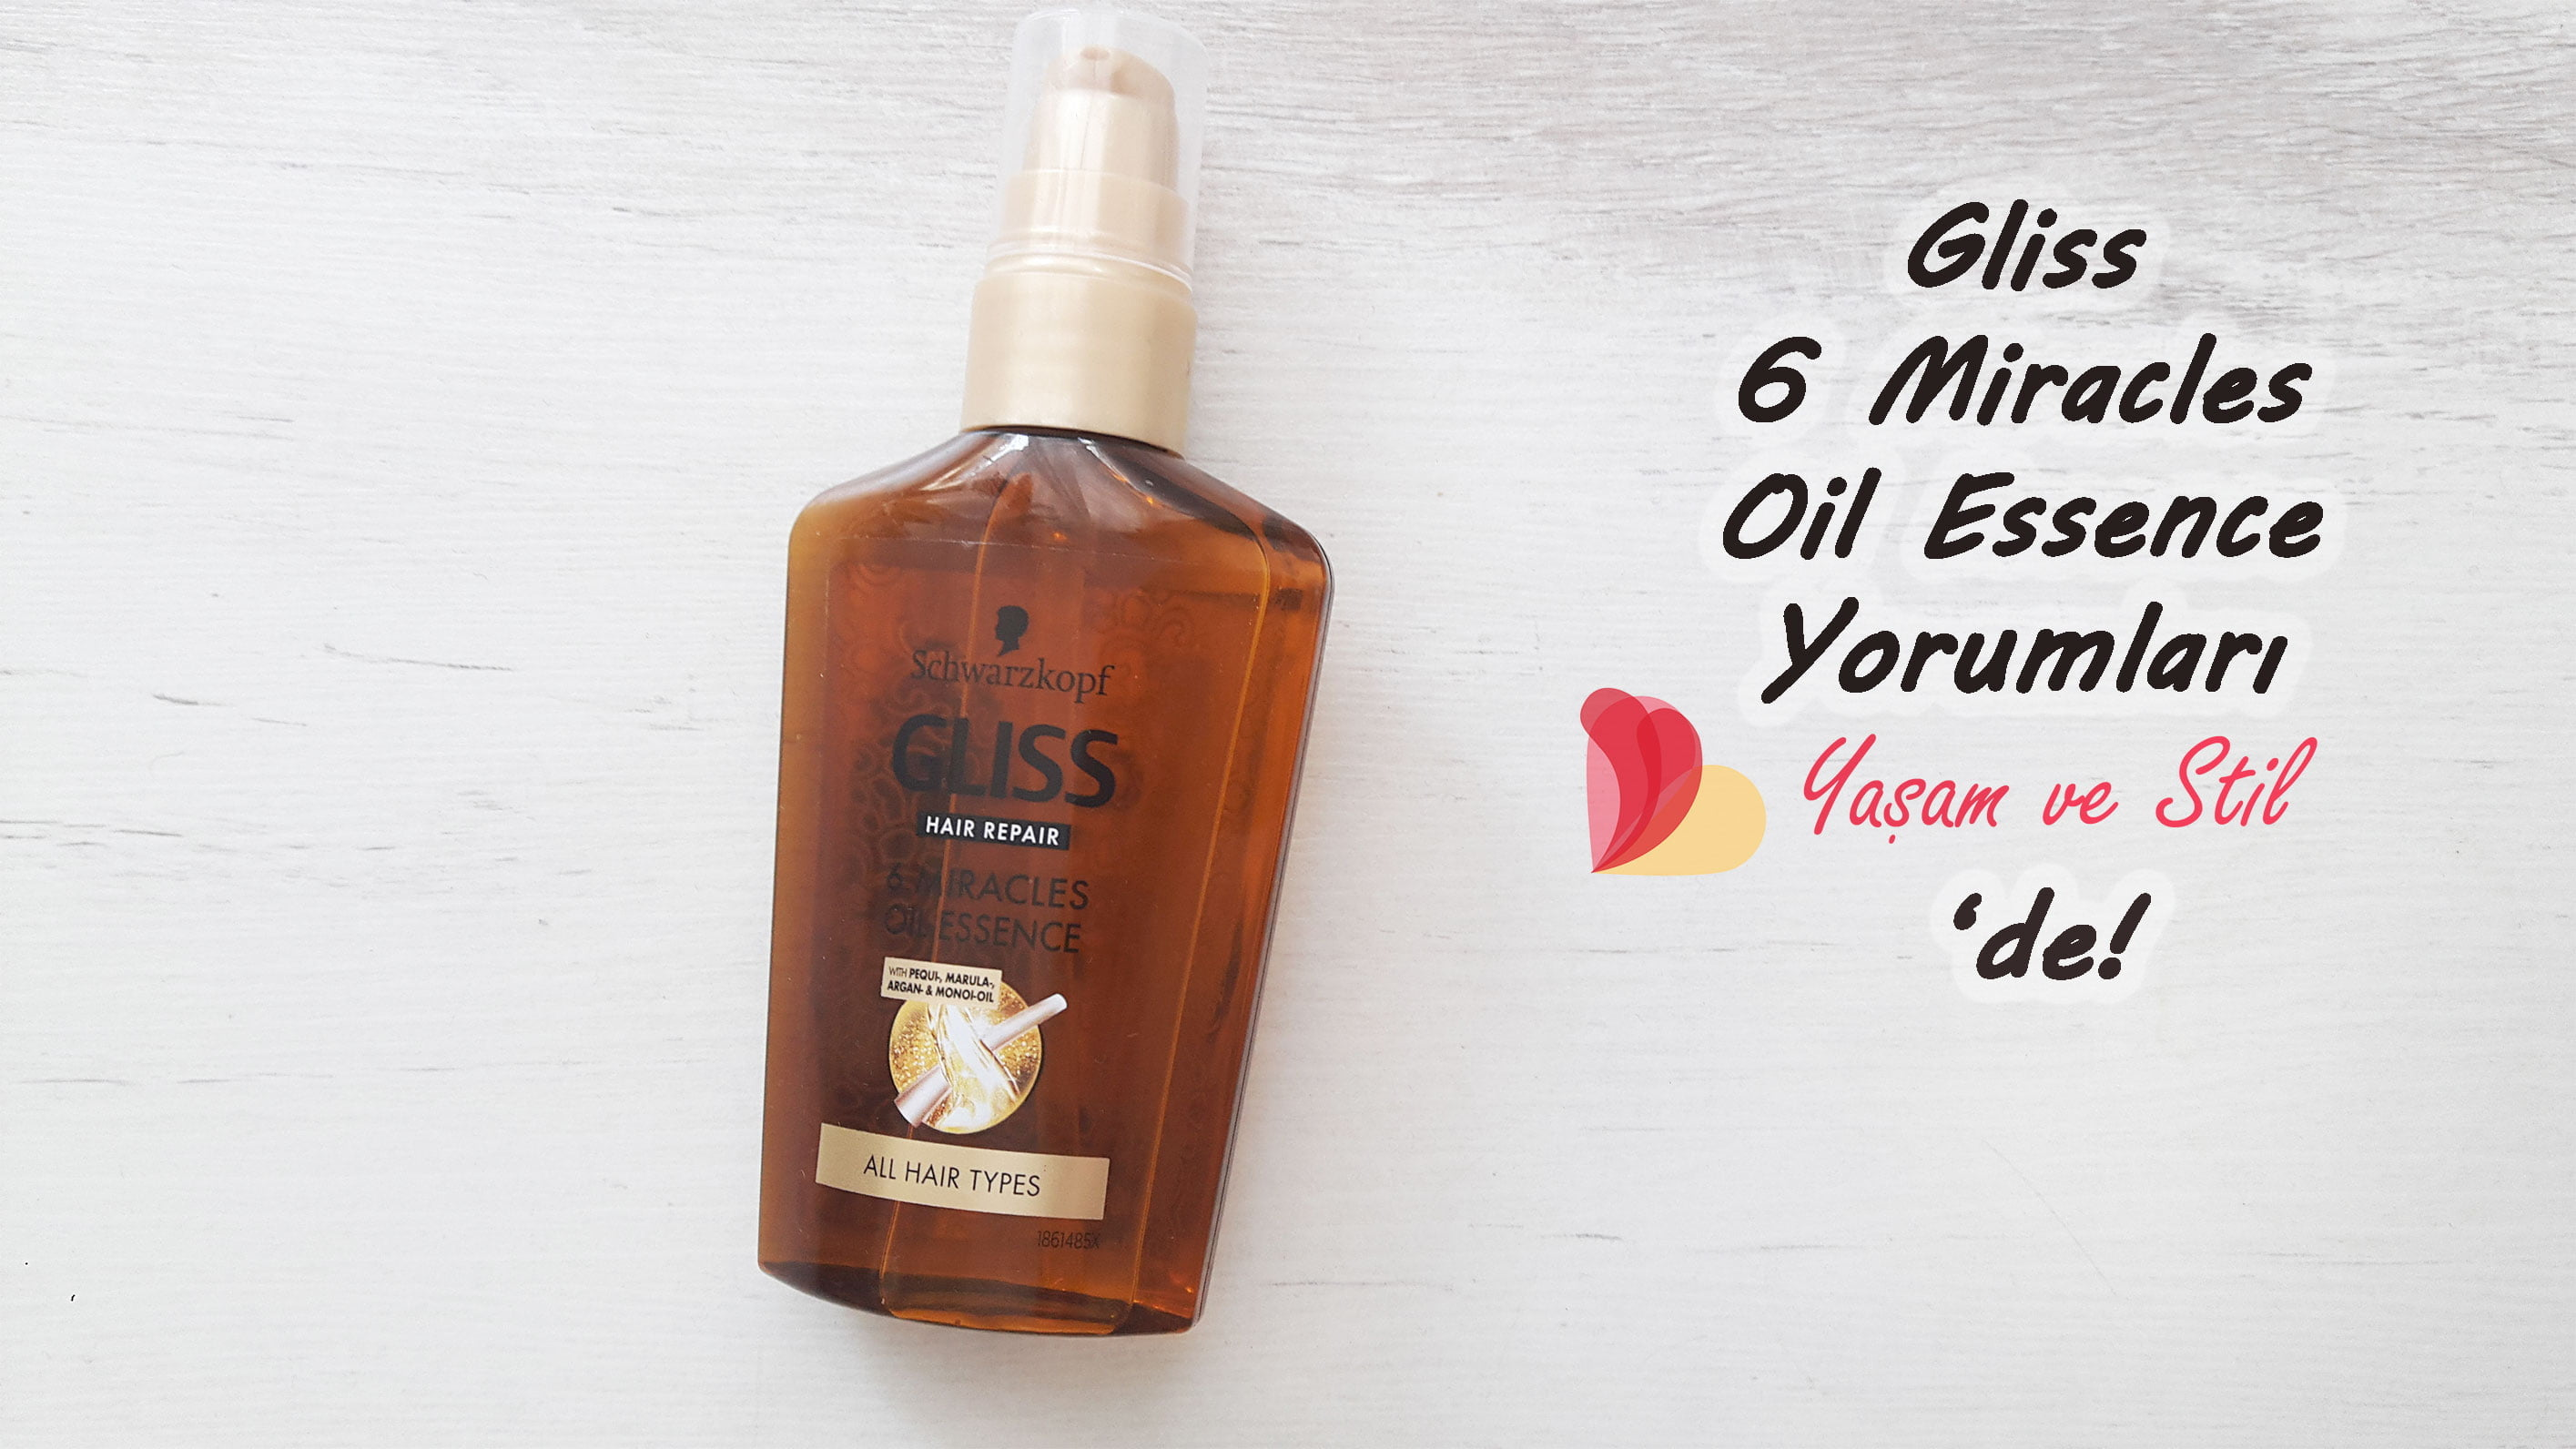 Gliss 6 Miracles Oil Essence Deneyimlerim